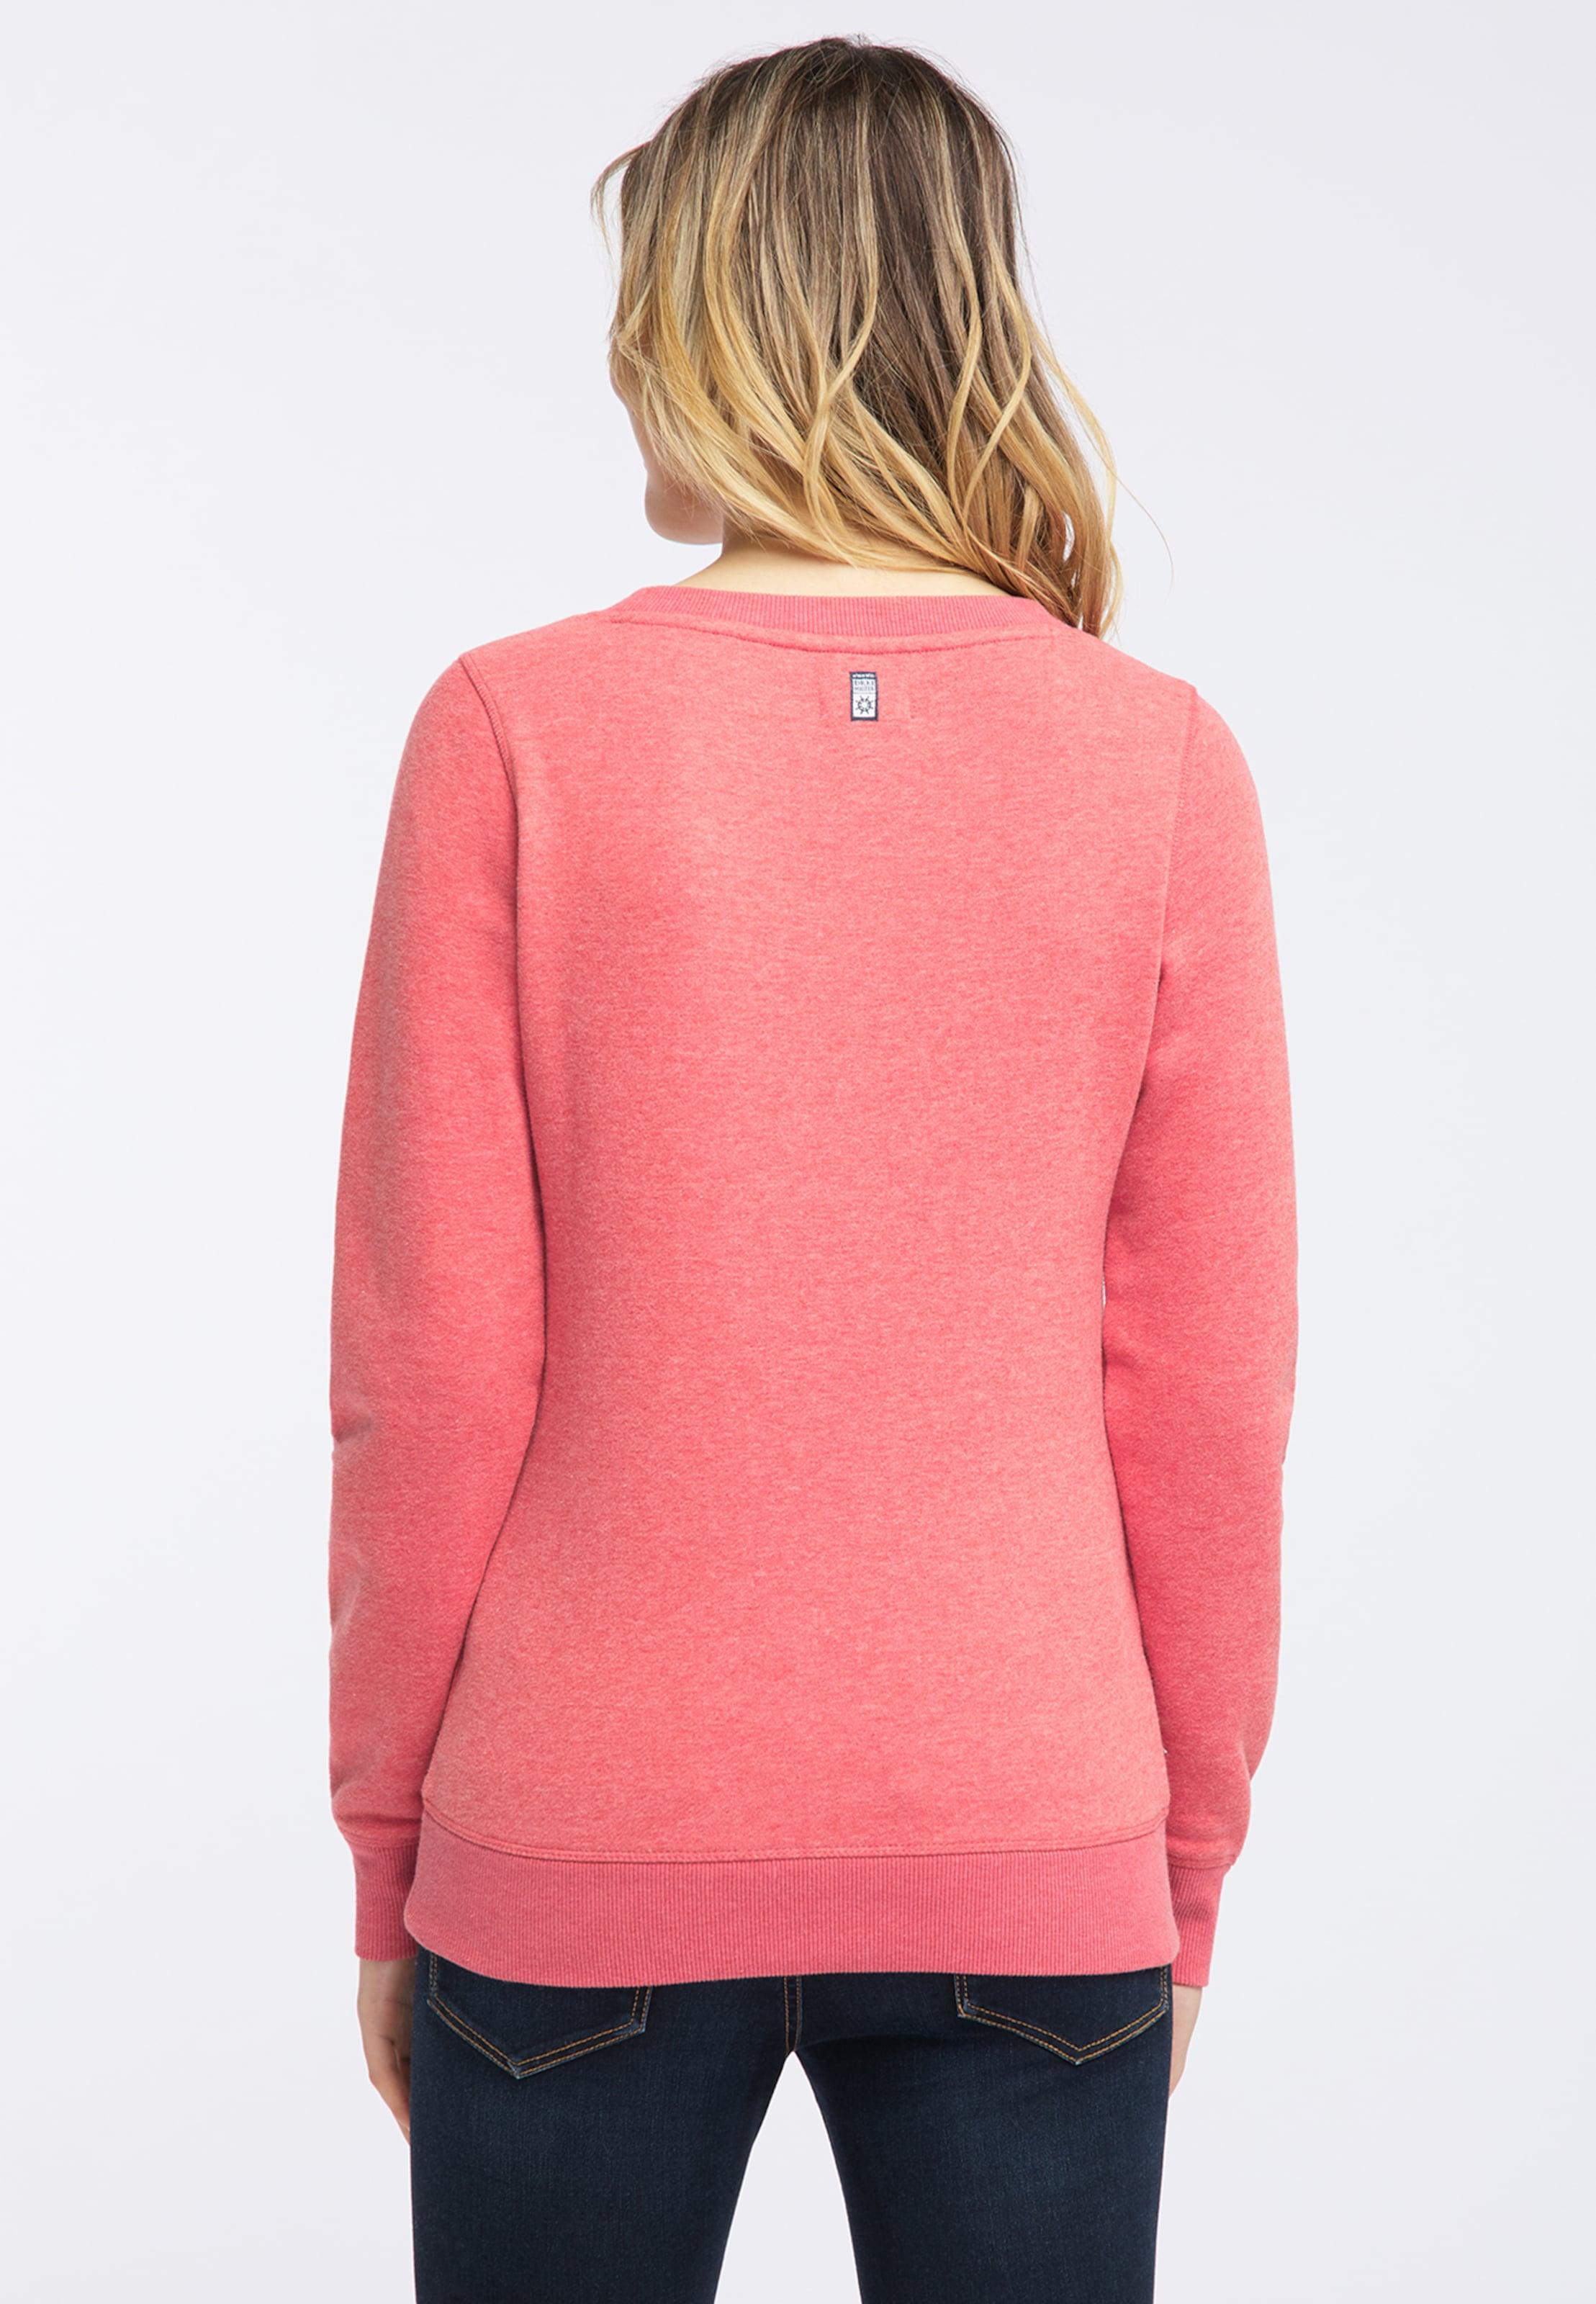 Sweat shirt CorailRose Dreimaster Rouge En wNv8ynO0m